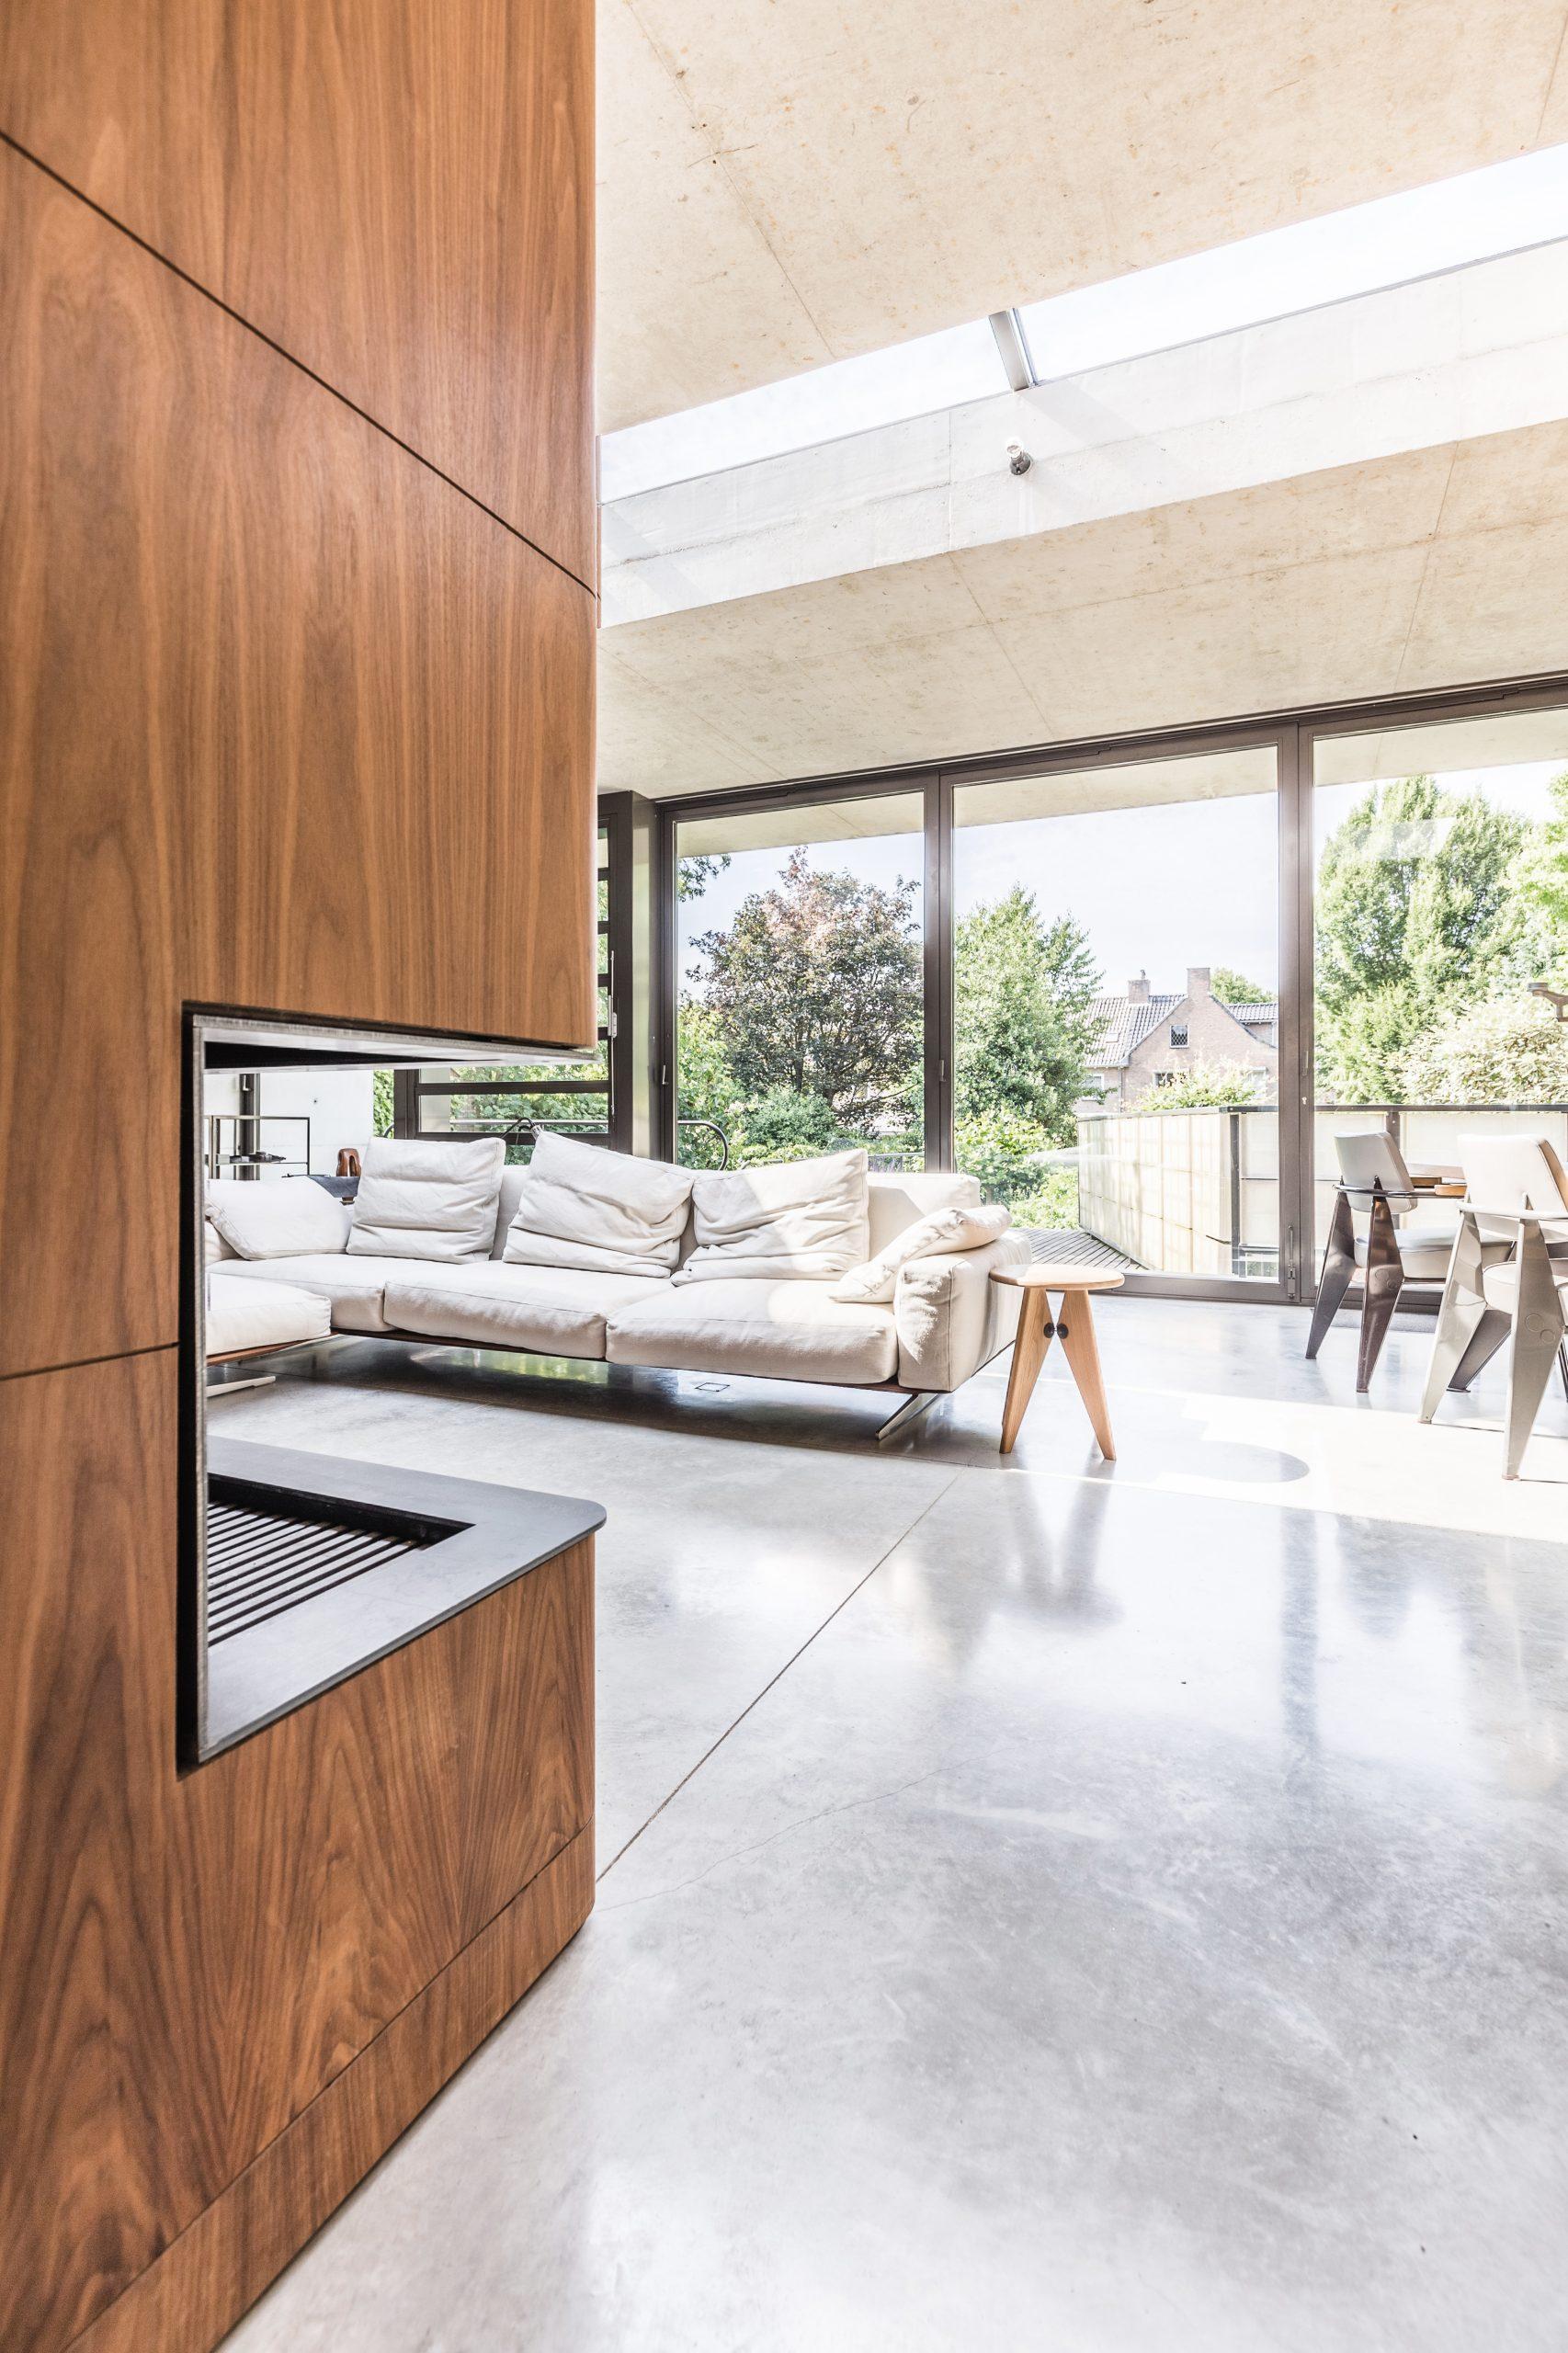 Open Garden open living room design with fireplace